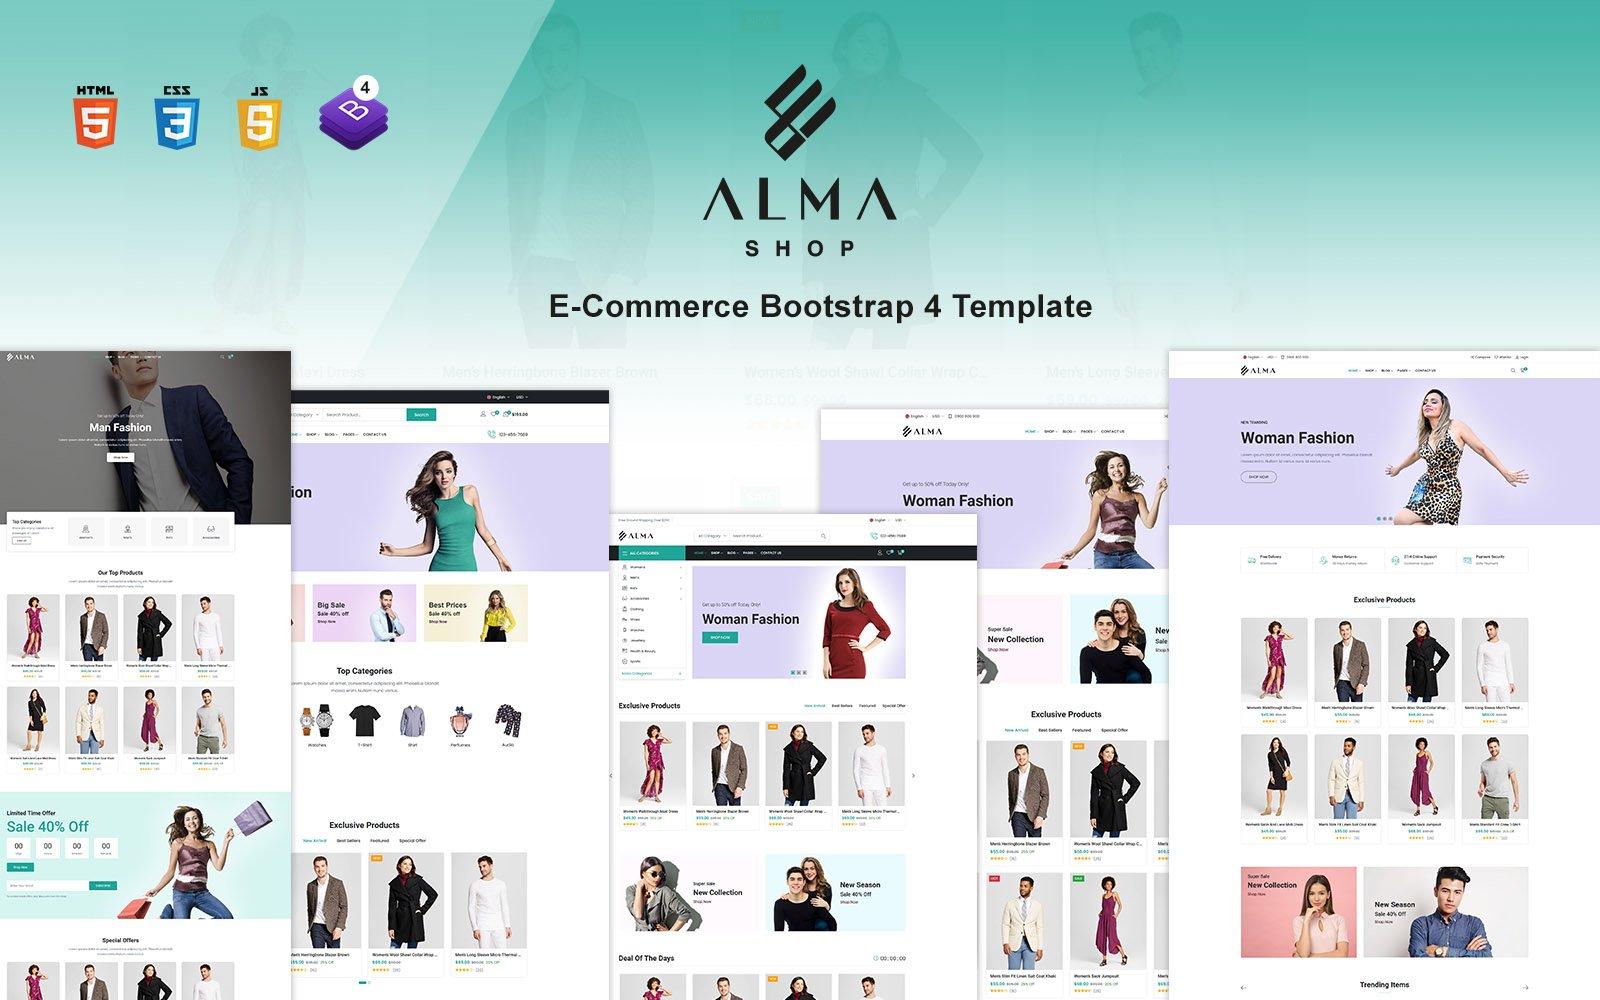 Alma Shop - eCommerce Bootstrap 4 Website Template